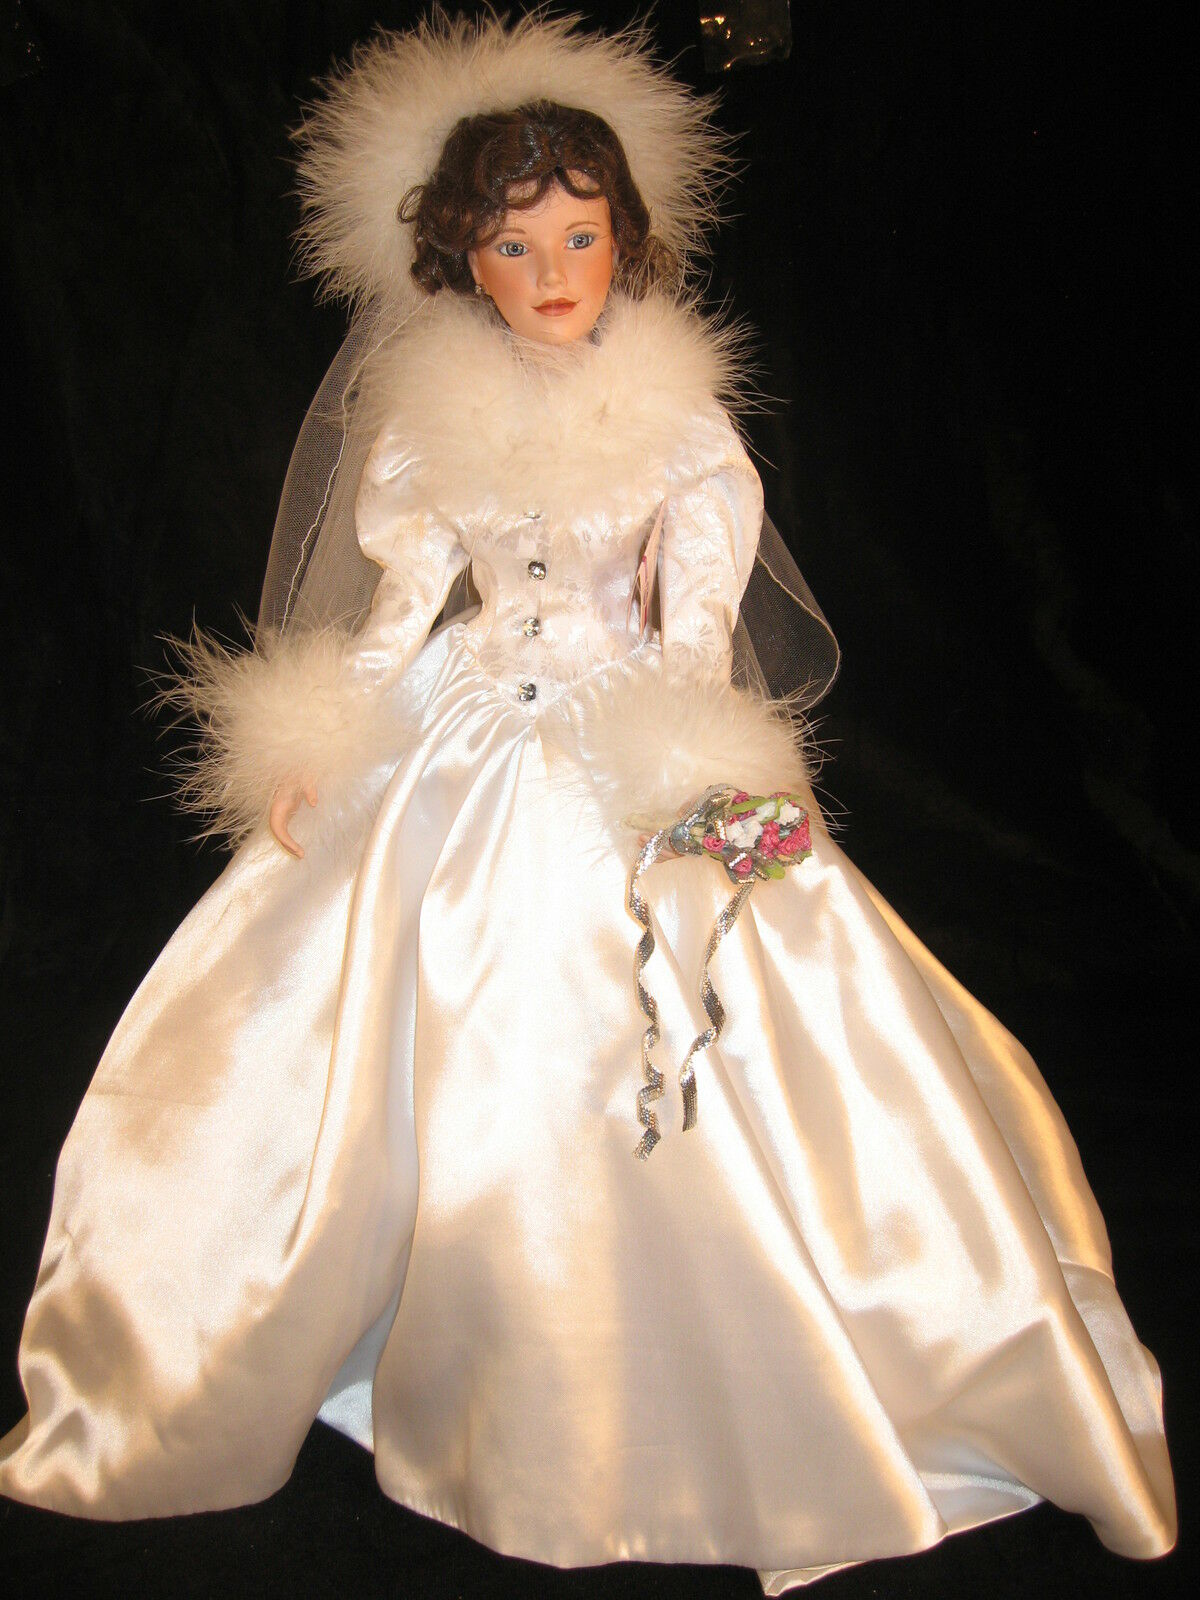 Bride Doll,  Porcelain,   Winter Romance  by Sandra Bilotto - 1996